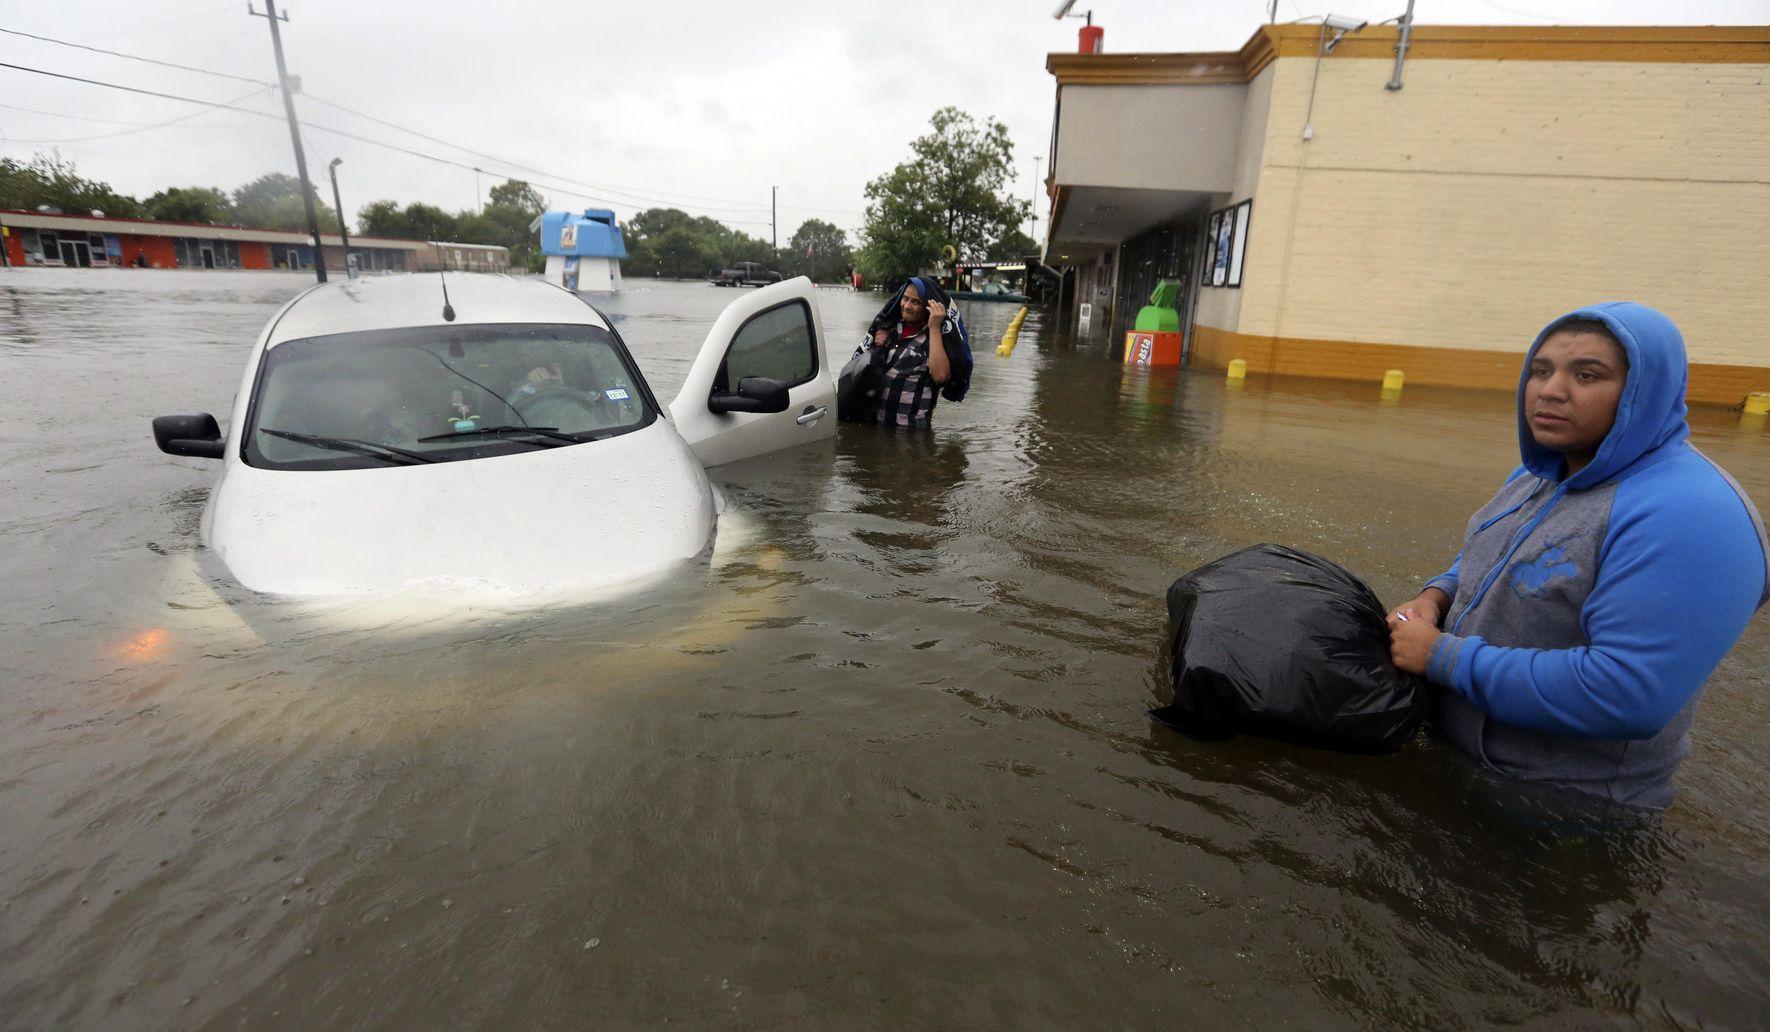 The Latest: 2nd major shelter for Harvey evacuees opens - Washington